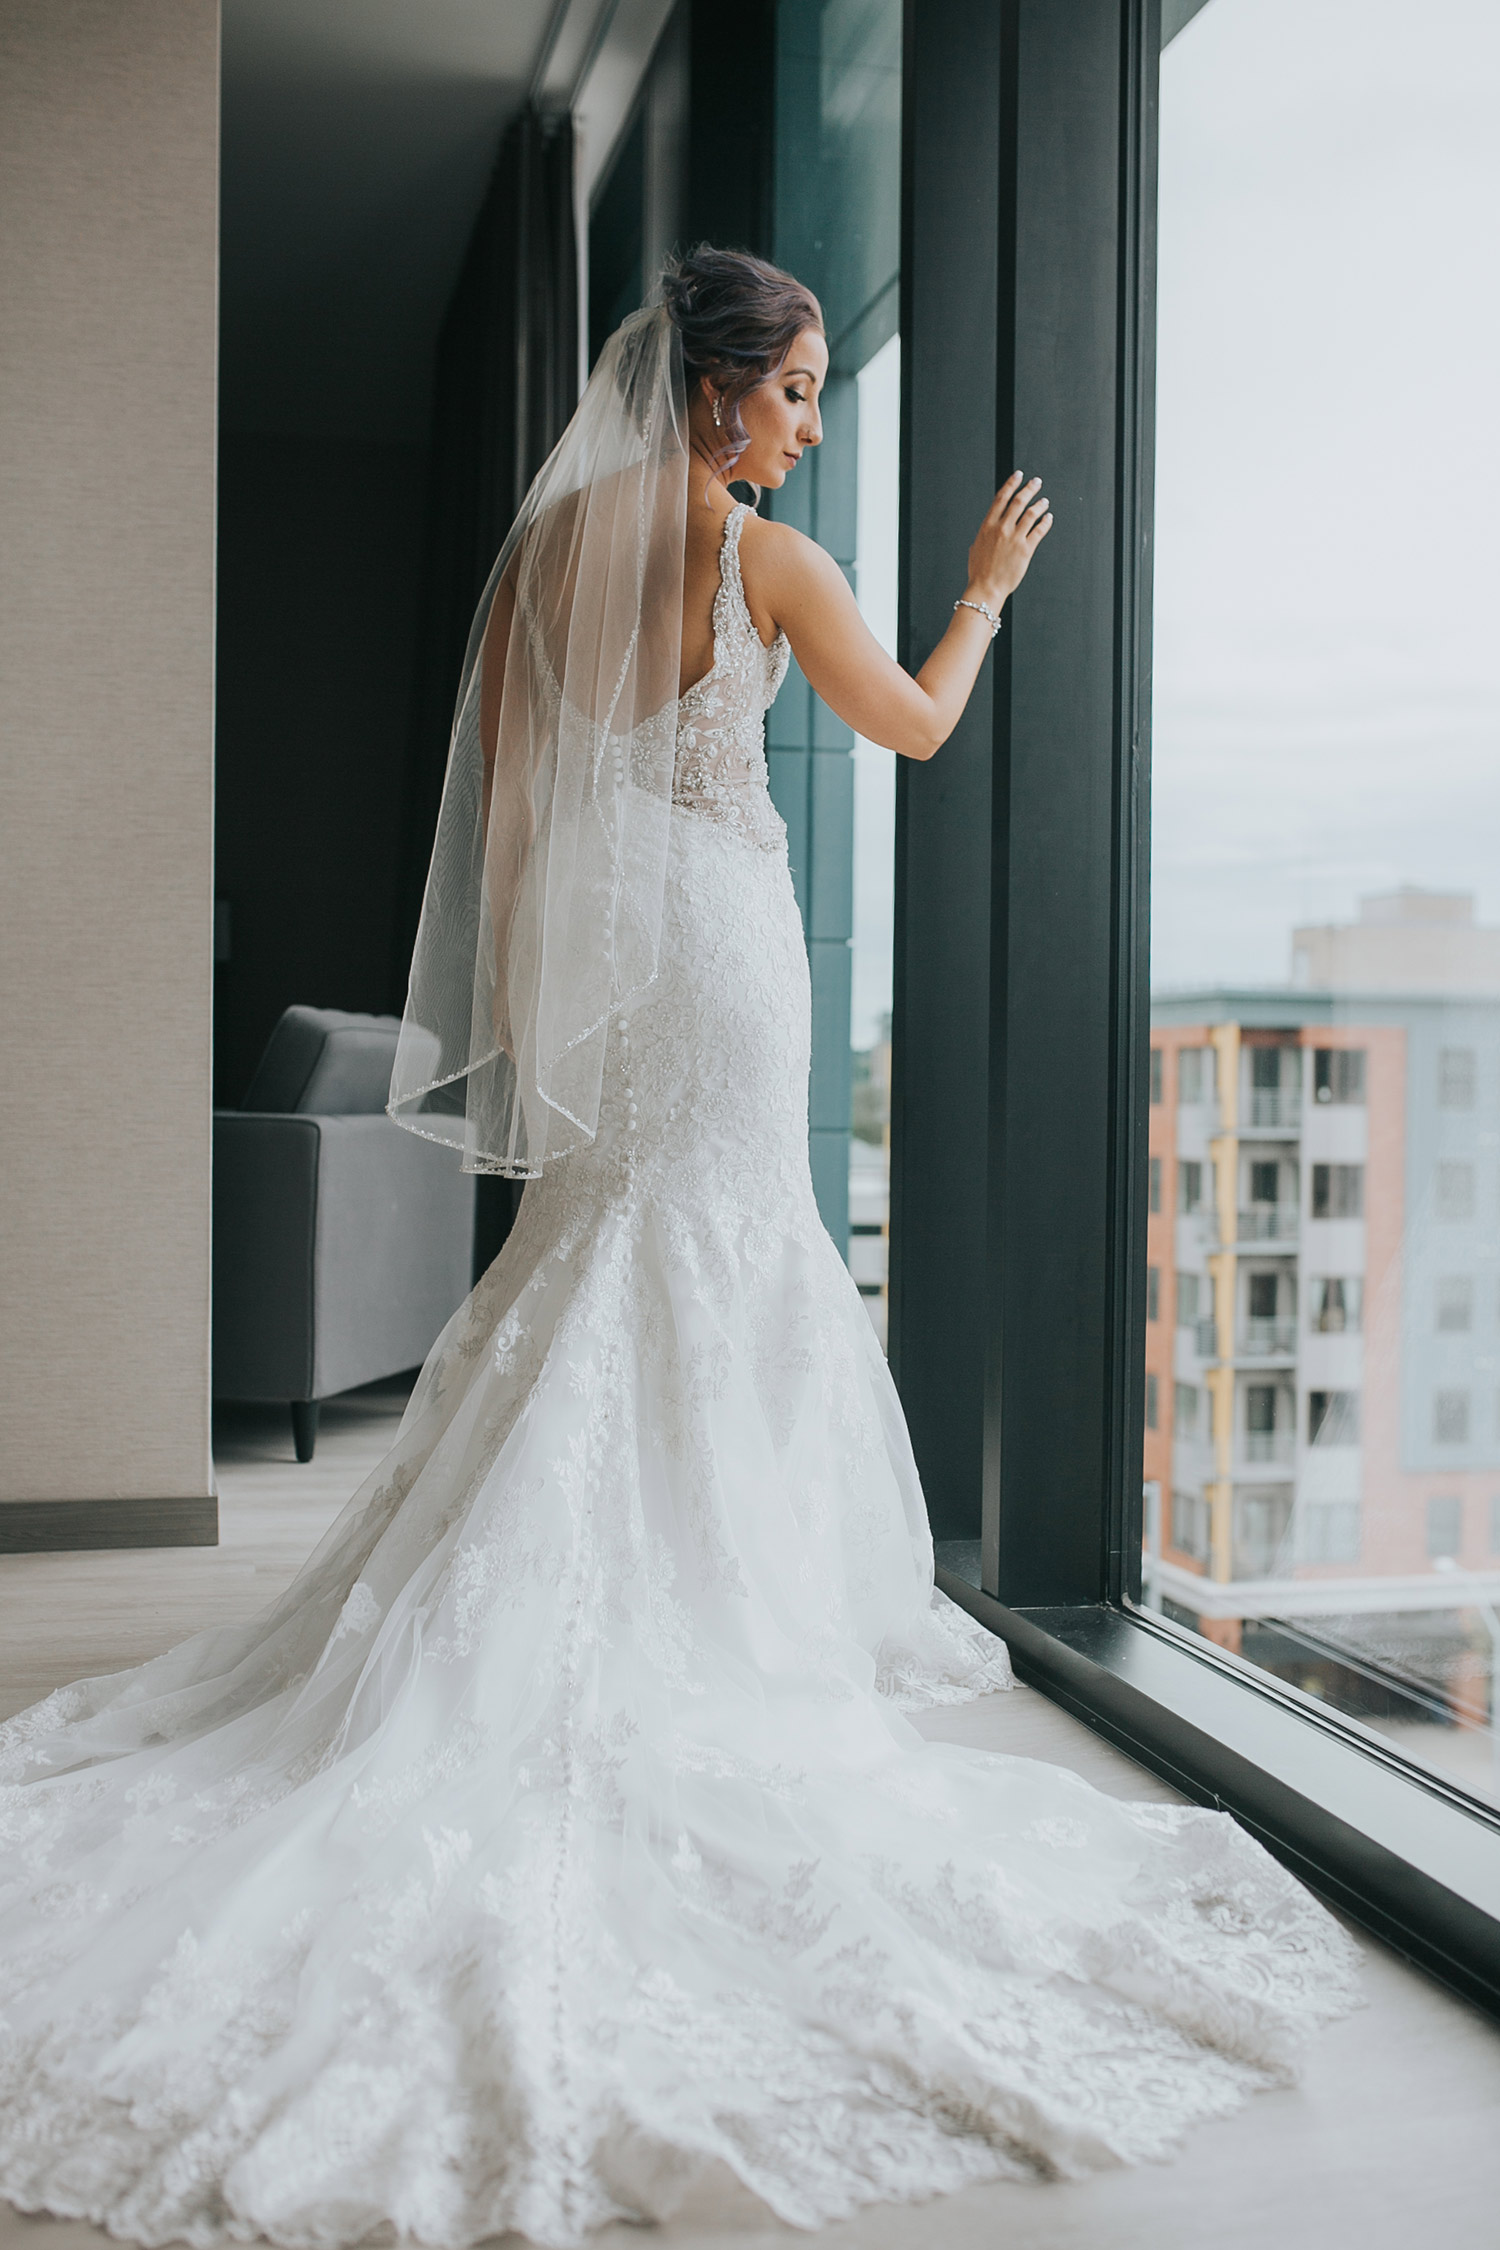 bride-posing-by-suite-window-desmoines-iowa-ac-hotel-raelyn-ramey-photography.jpg